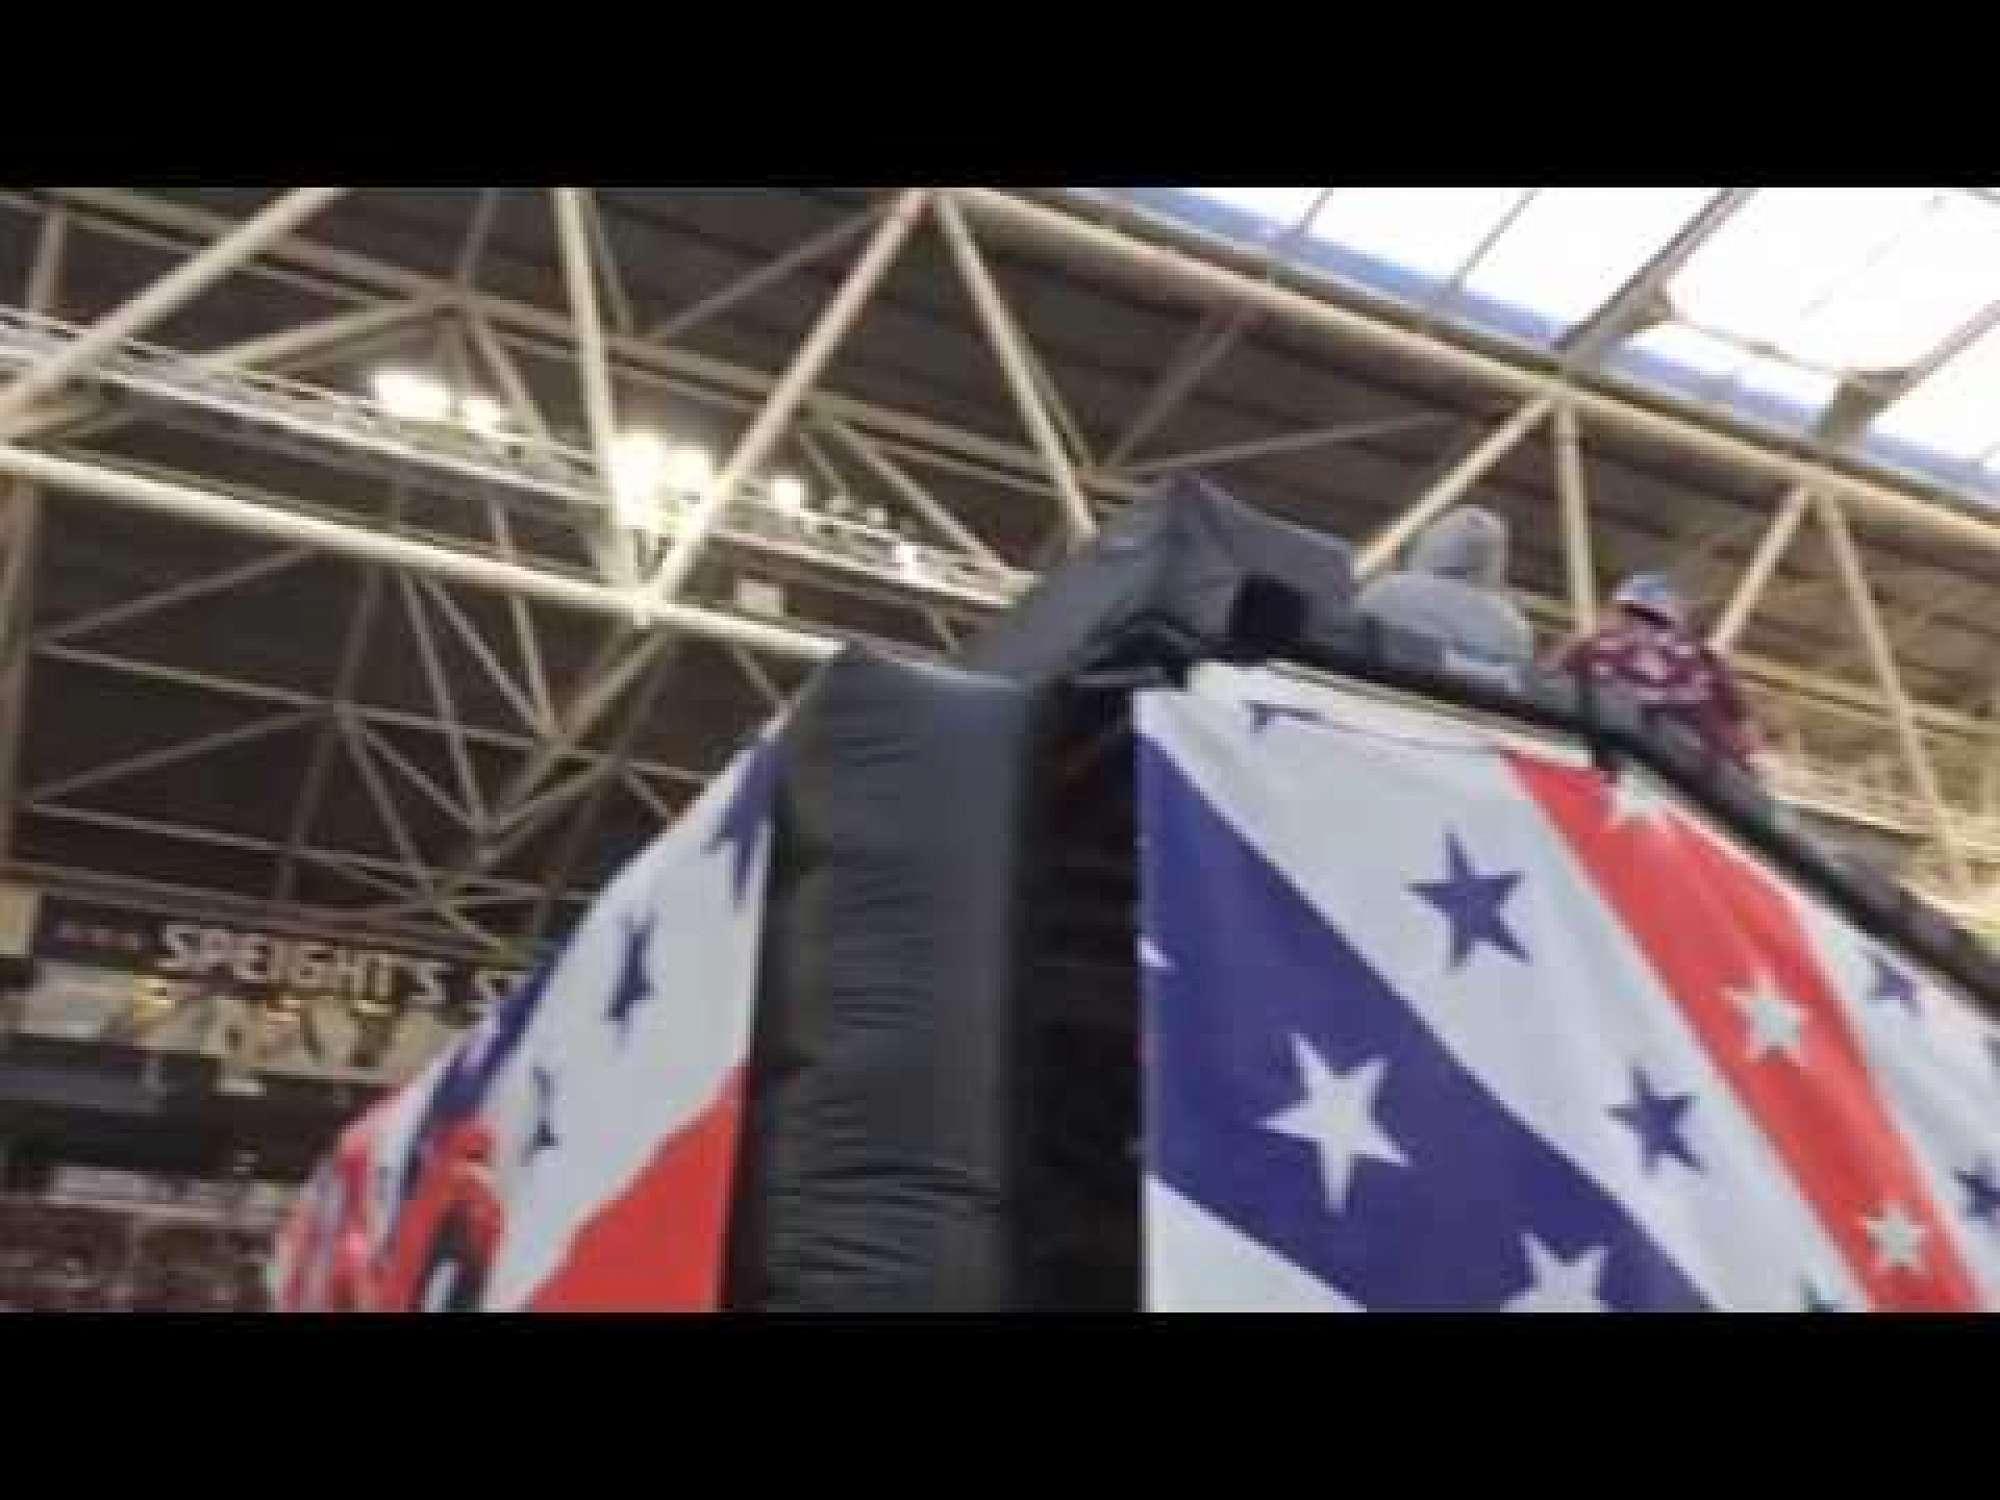 Nitro Circus 2015 at Forsyth Barr Stadium